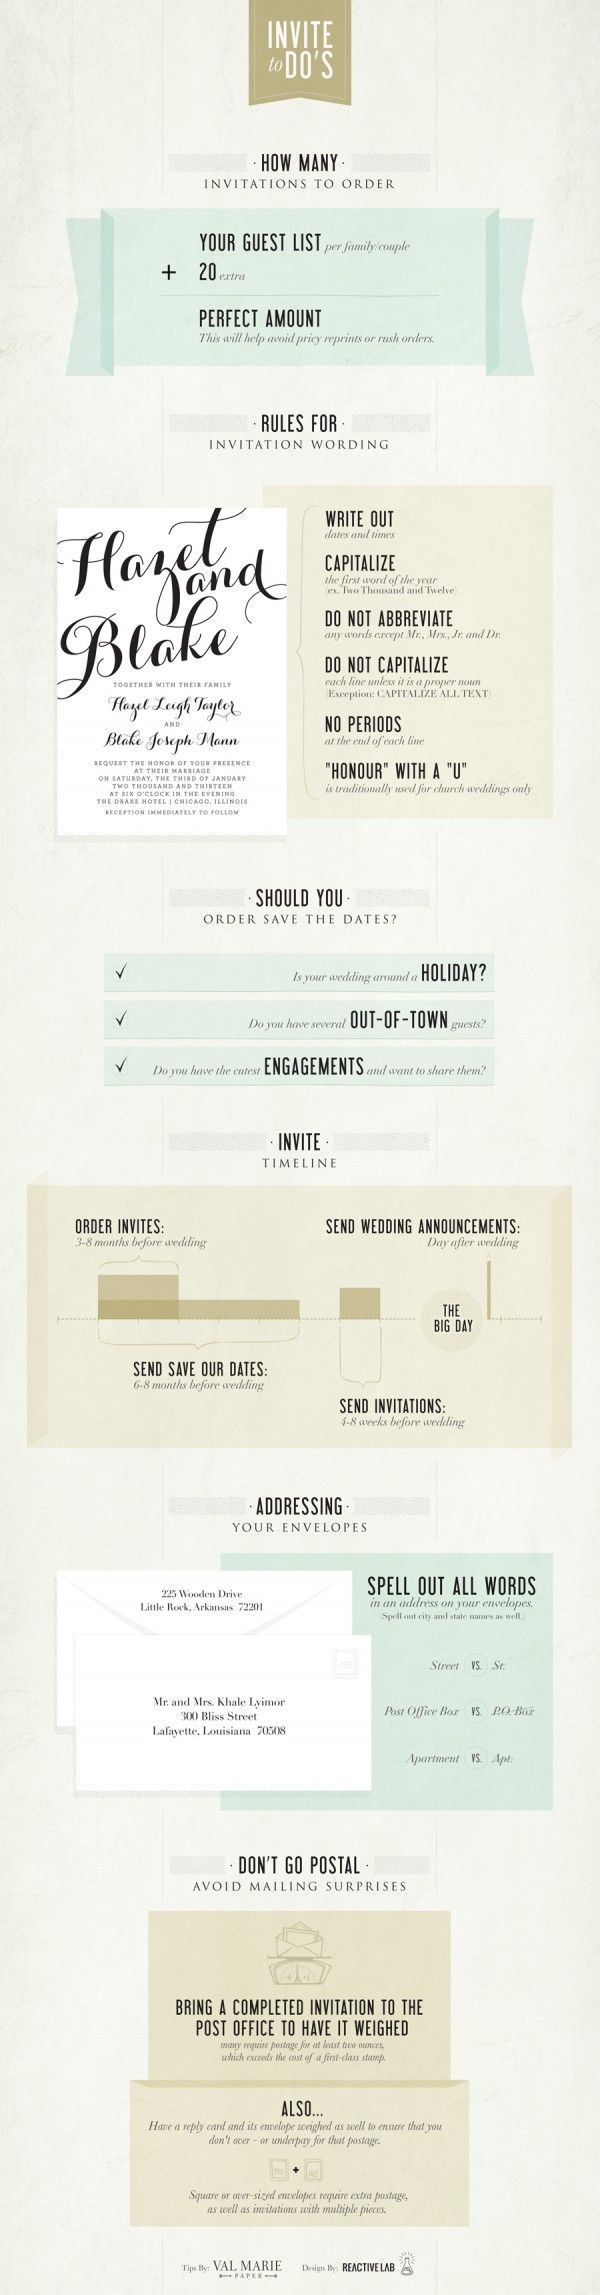 Wedding Invitation Tips | Val Marie Paper